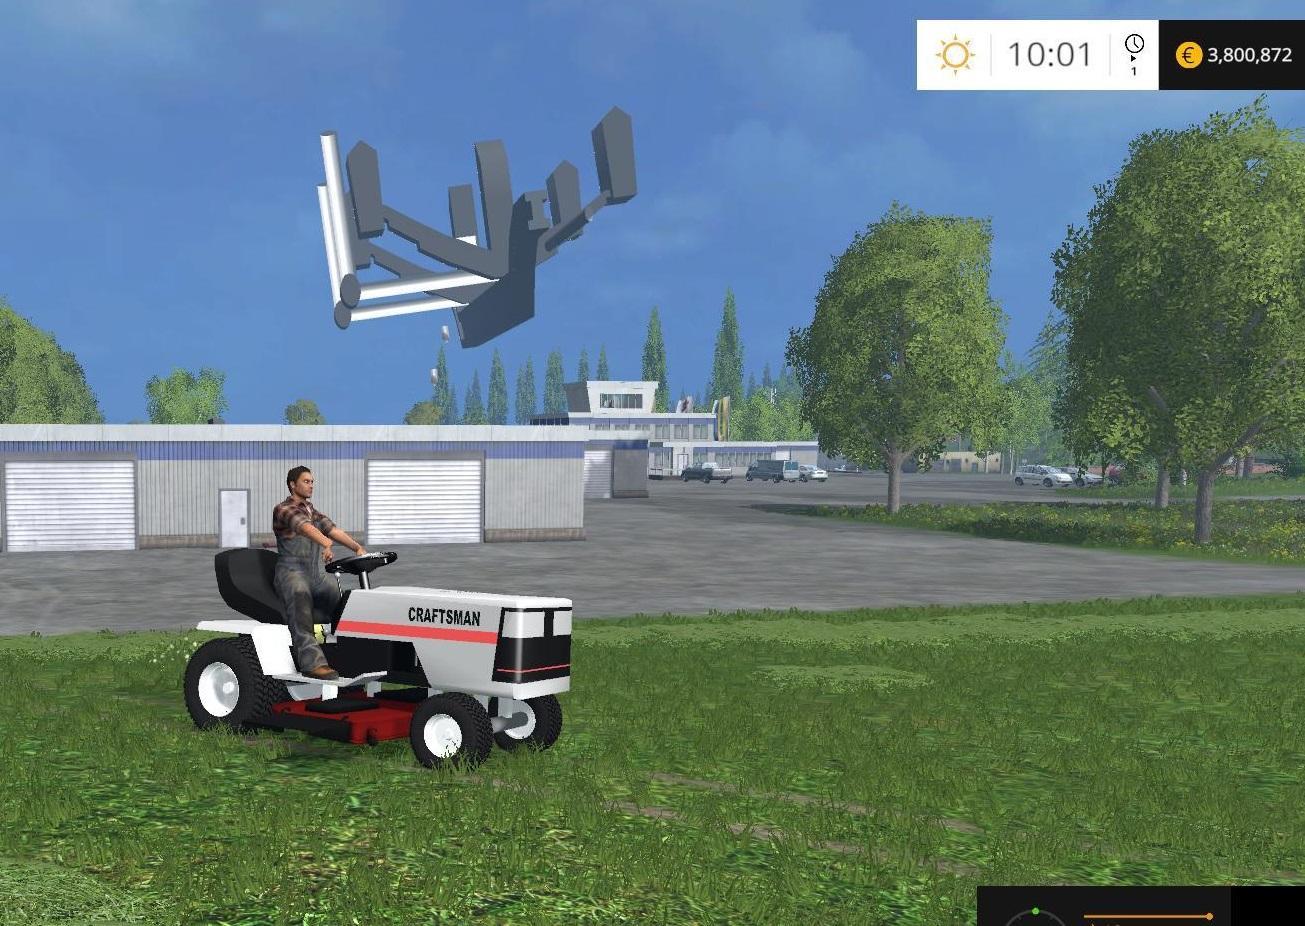 1455270557_8627-craftsman-riding-mower-read-the-description-1_3